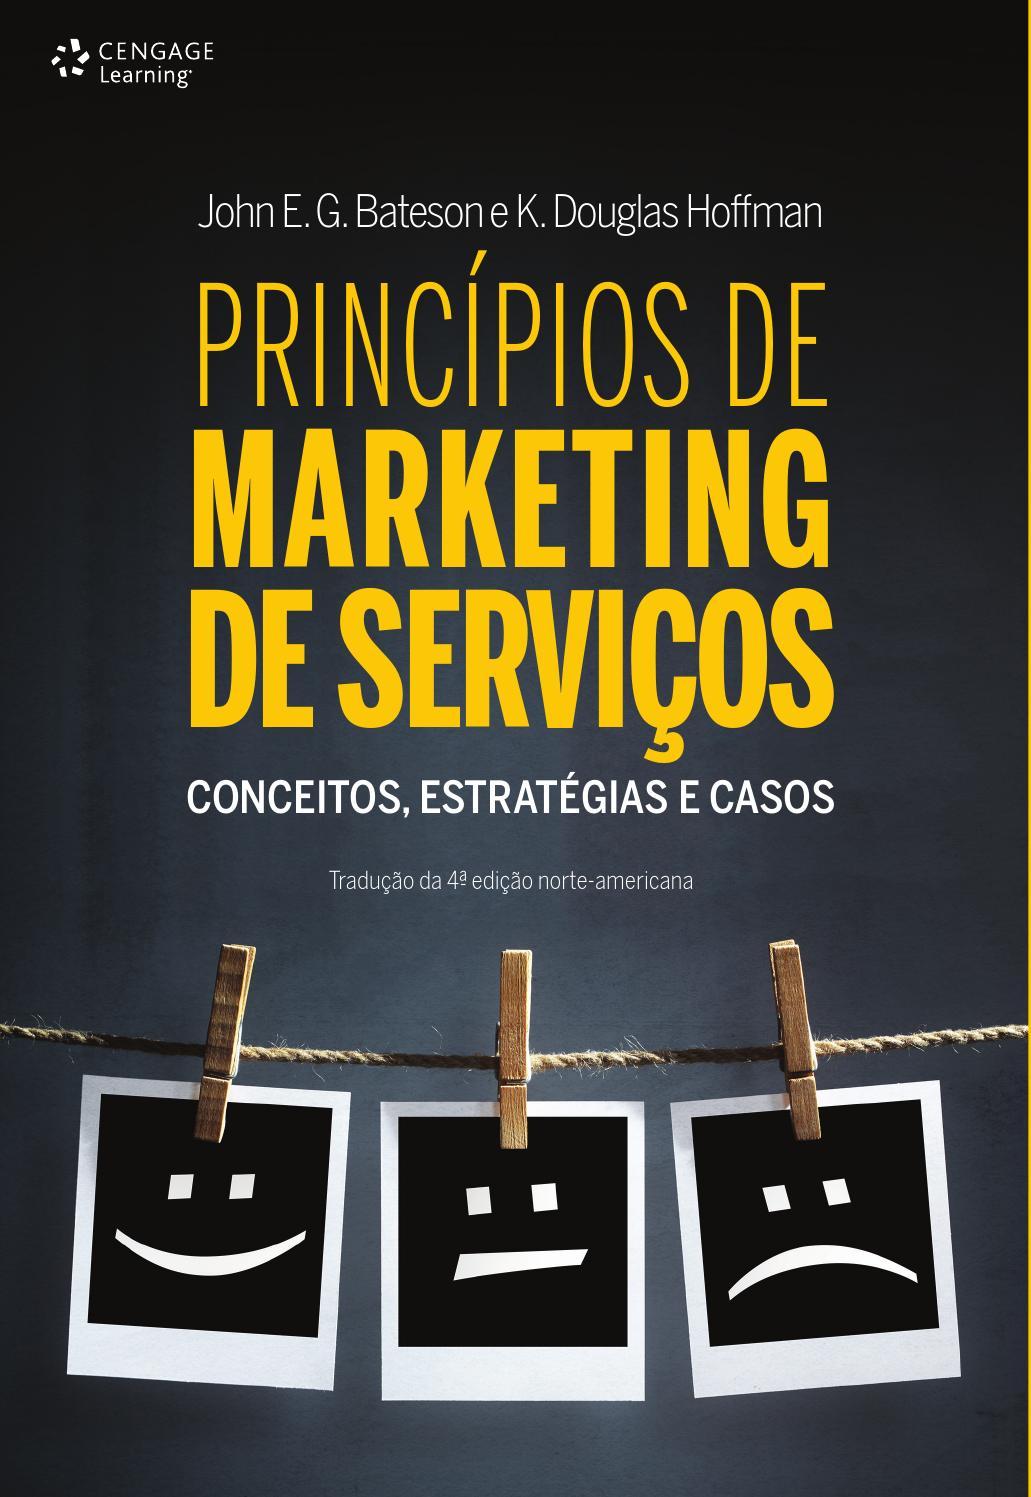 Marketing mix de serviços - Economias